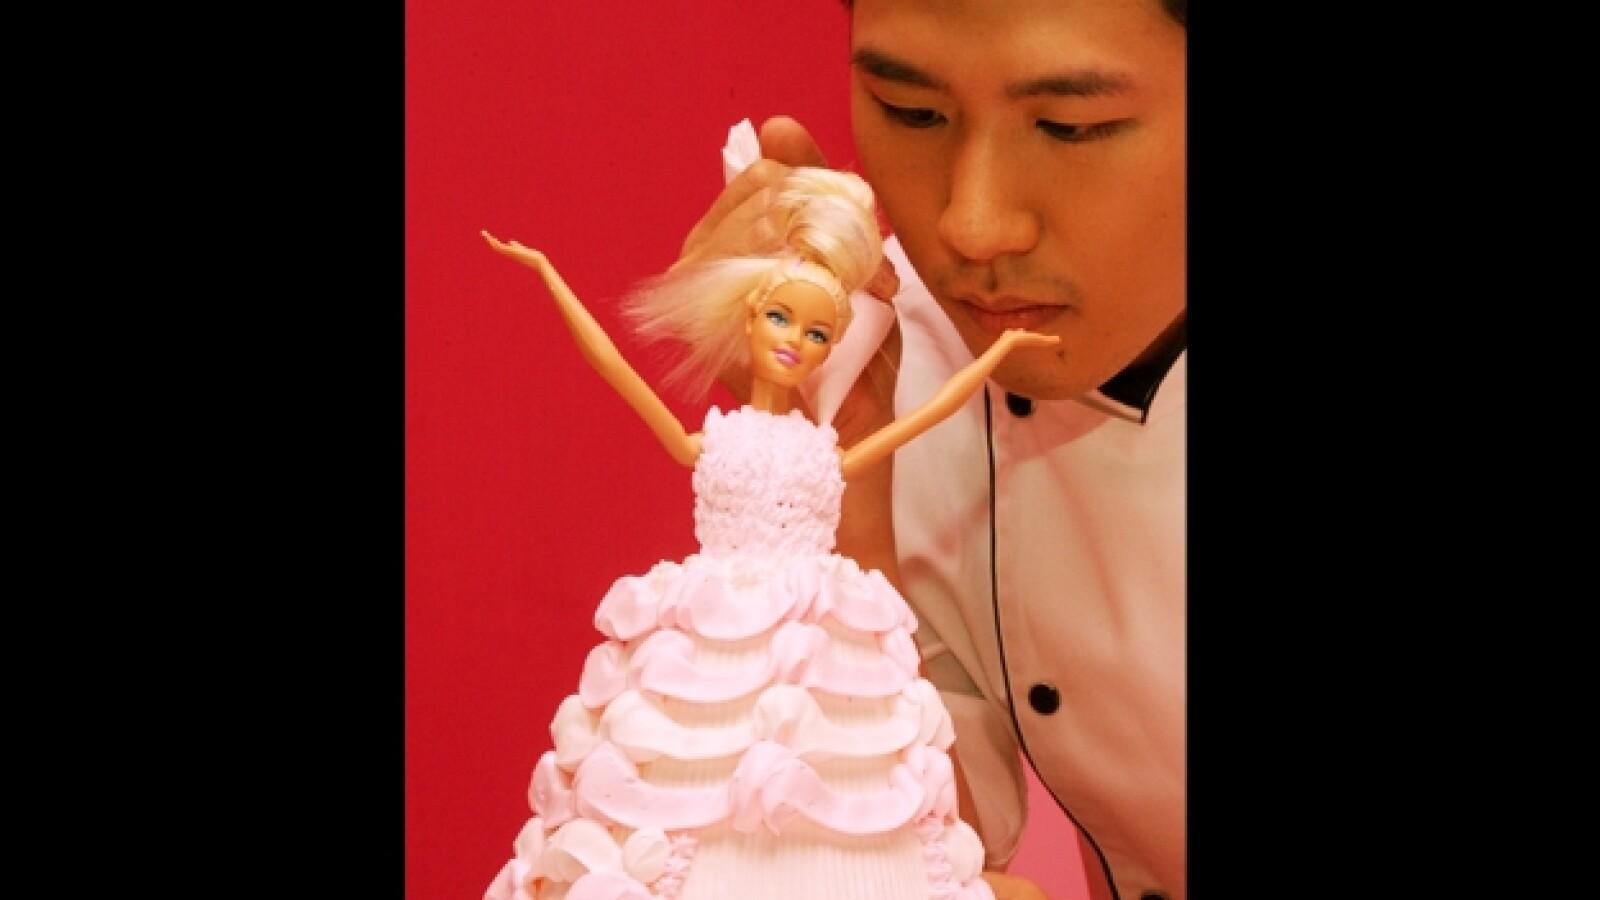 barbie, taipei, taiwan, restaurante, cafeteria, barbie cafe, hello kitty, mattel, sinlaku